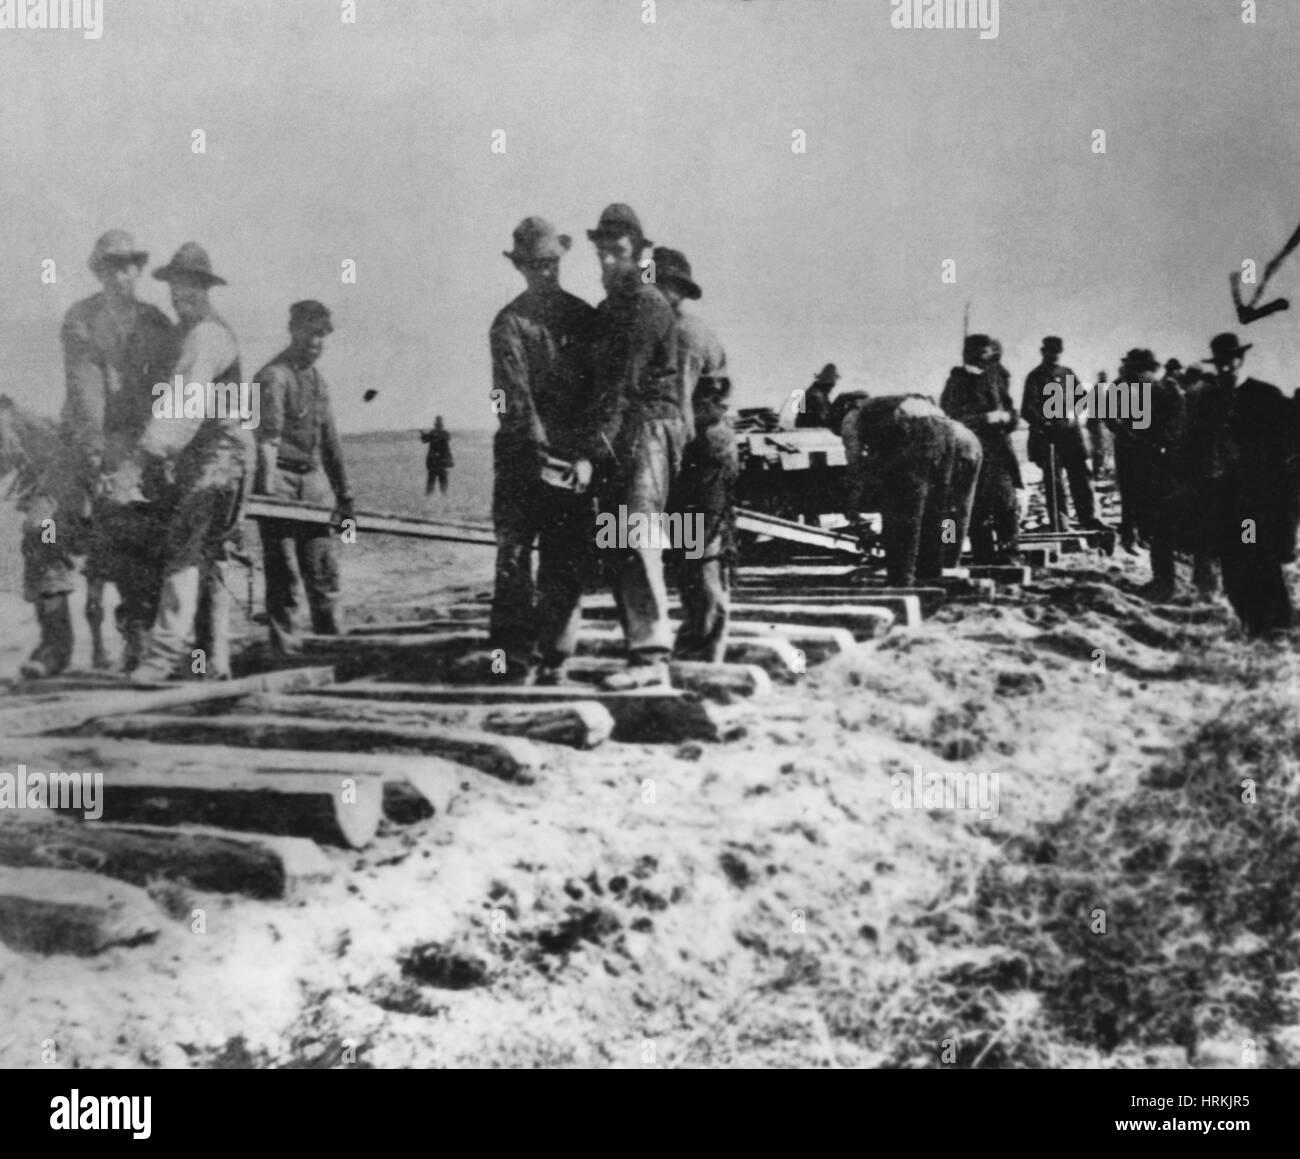 Laying Tracks, 1868 - Stock Image